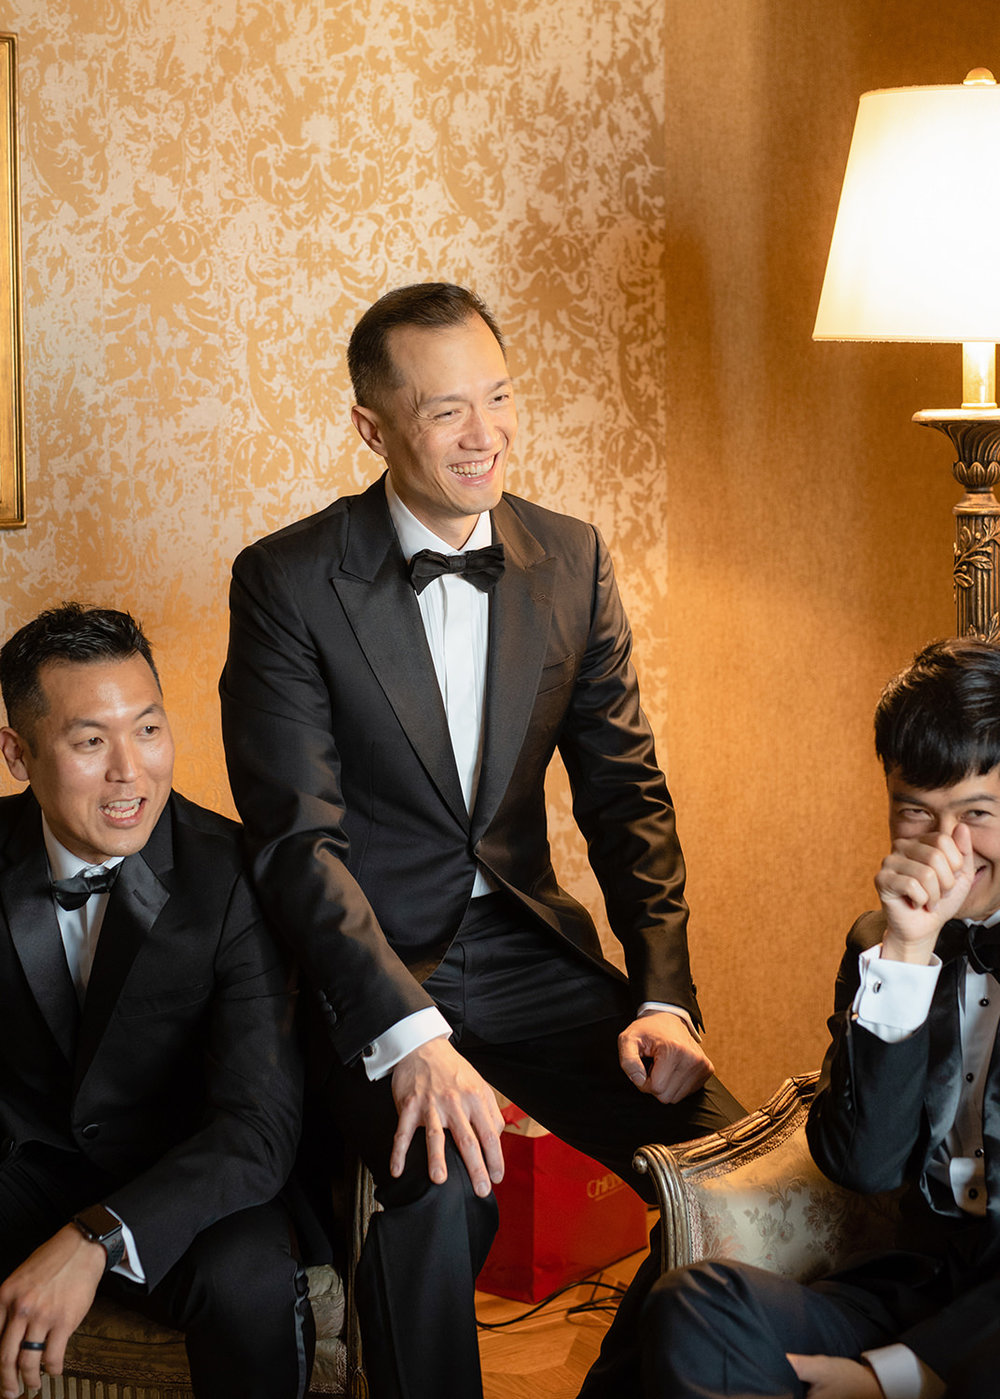 hotel-cipriani-venice-wedding-photographer-S&D-©bottega53-17.jpg